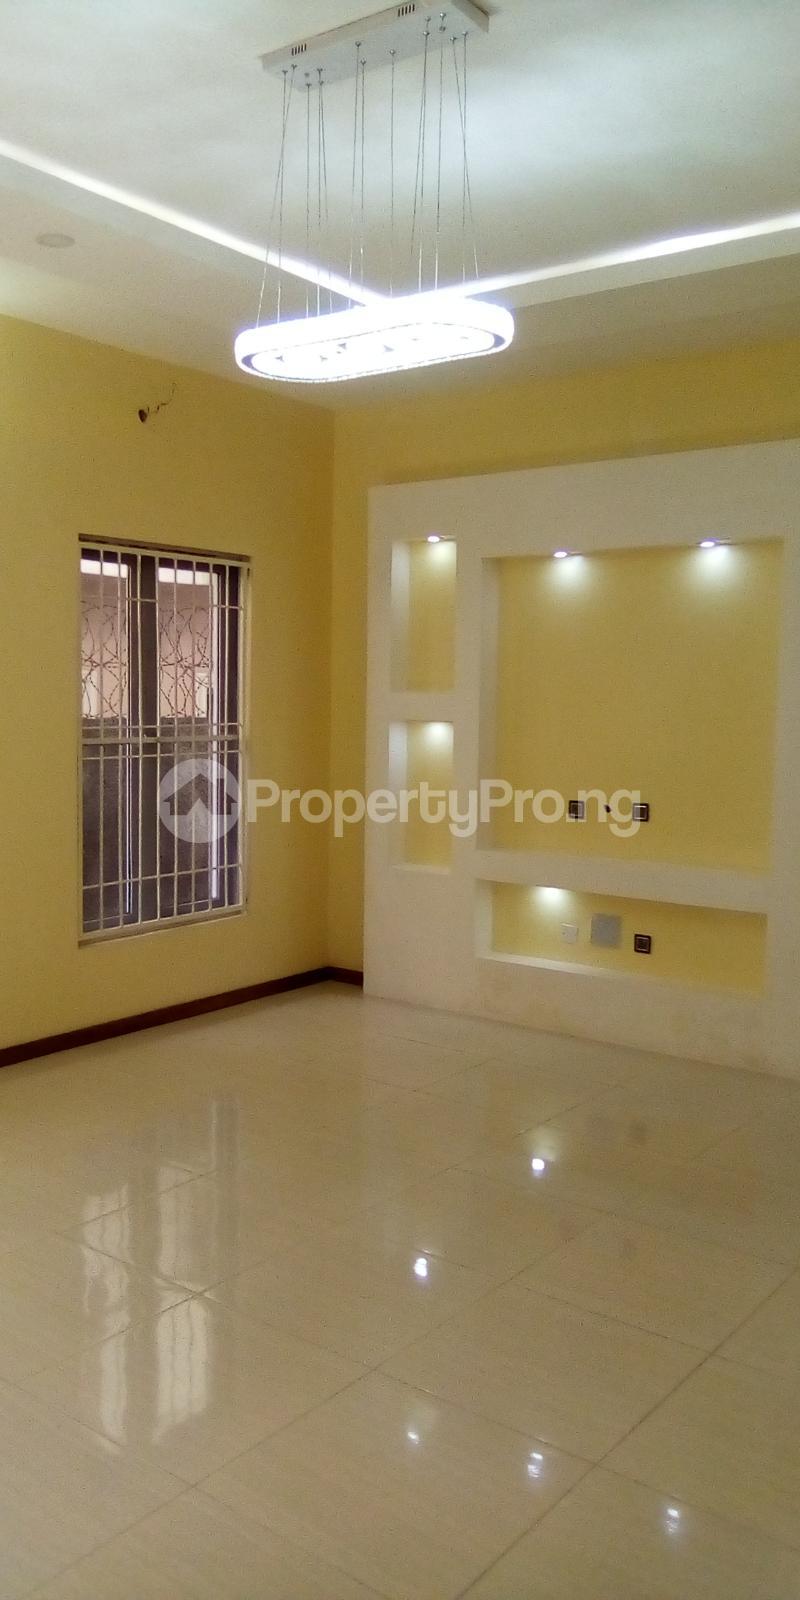 5 bedroom Detached Duplex for sale Southern View Oral Estate Lekki Lagos - 1